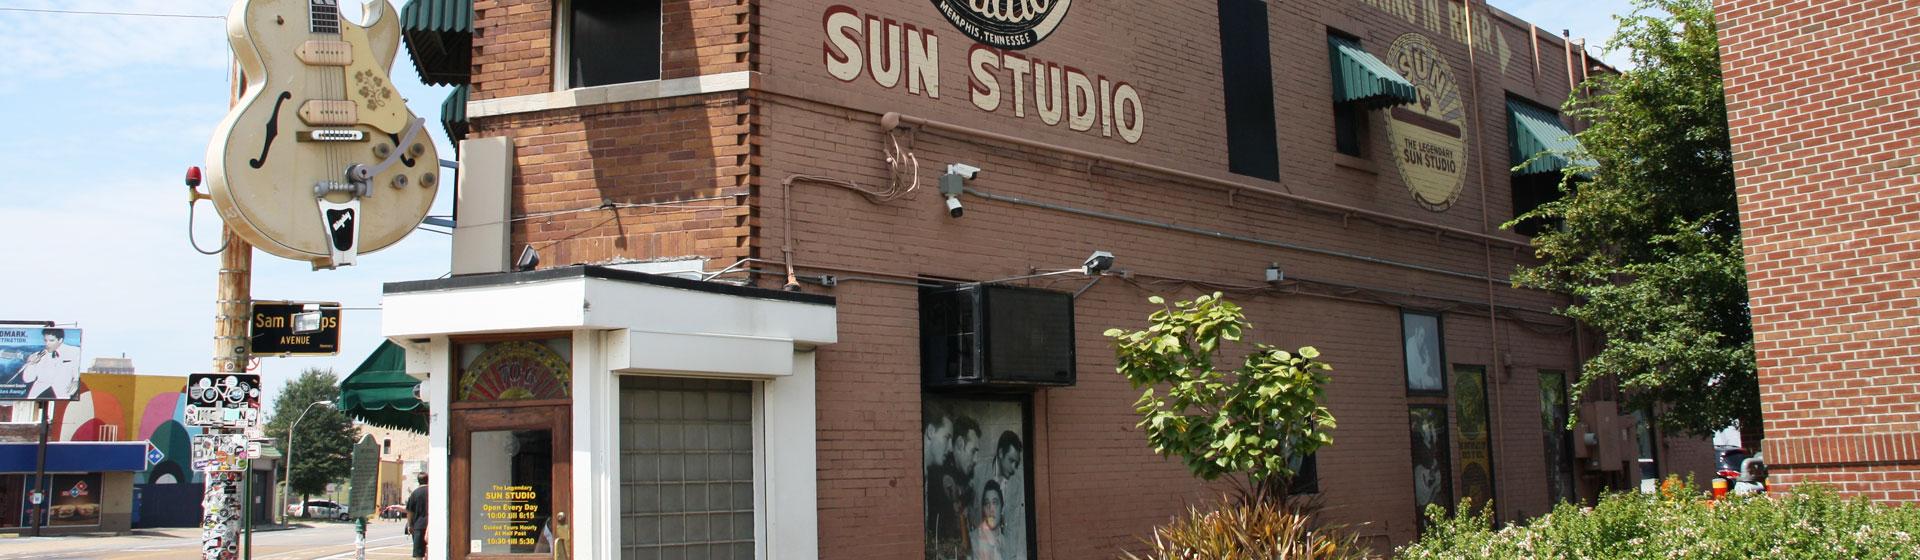 Sun Studio i Memphis, Tennessee.